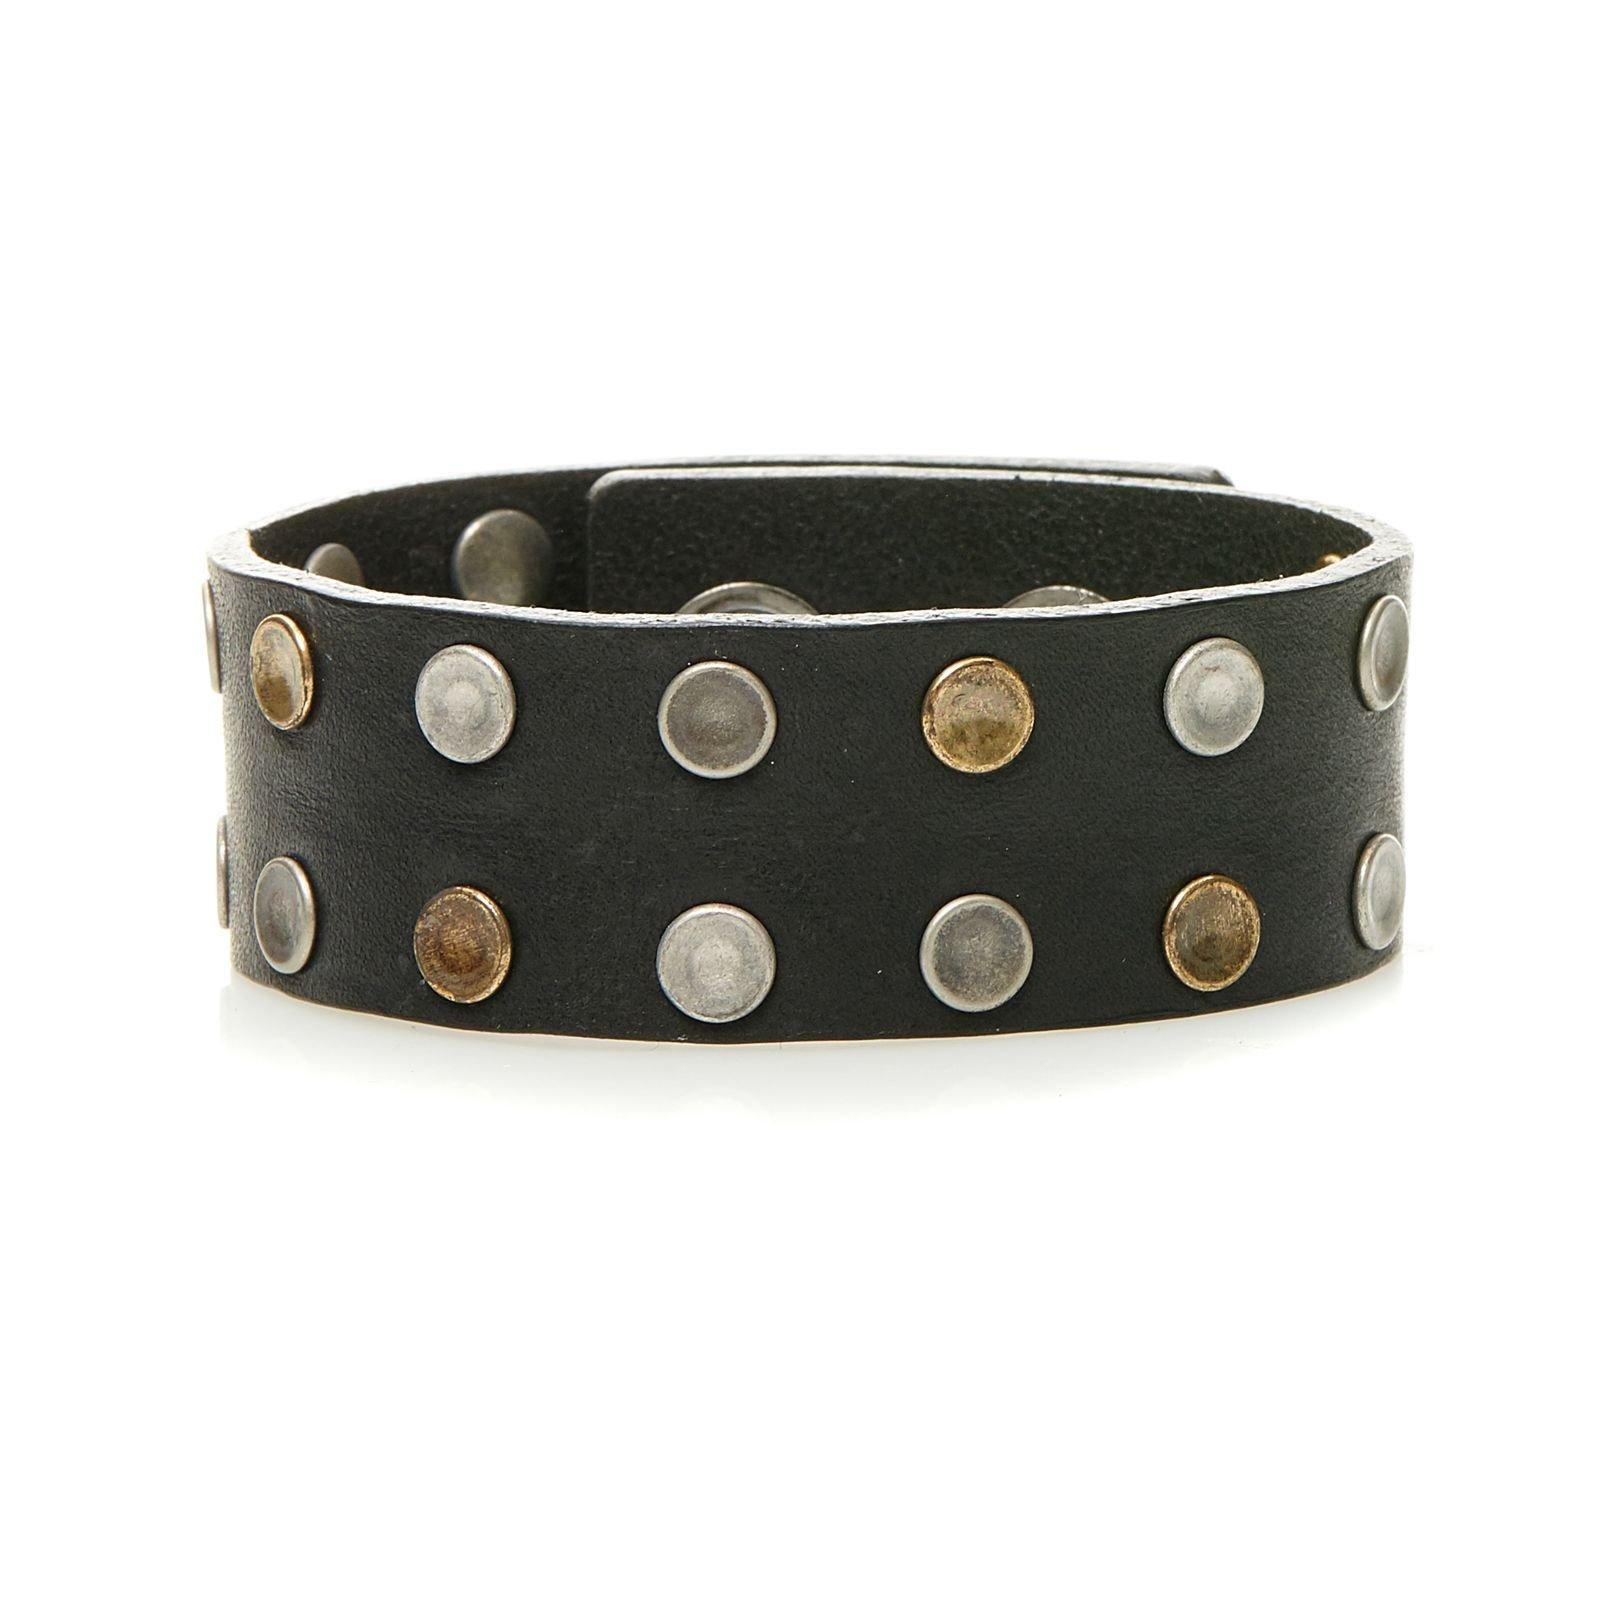 Diesel Mens ''A-DONE'' Leather Studded Cuff Bracelet, Black